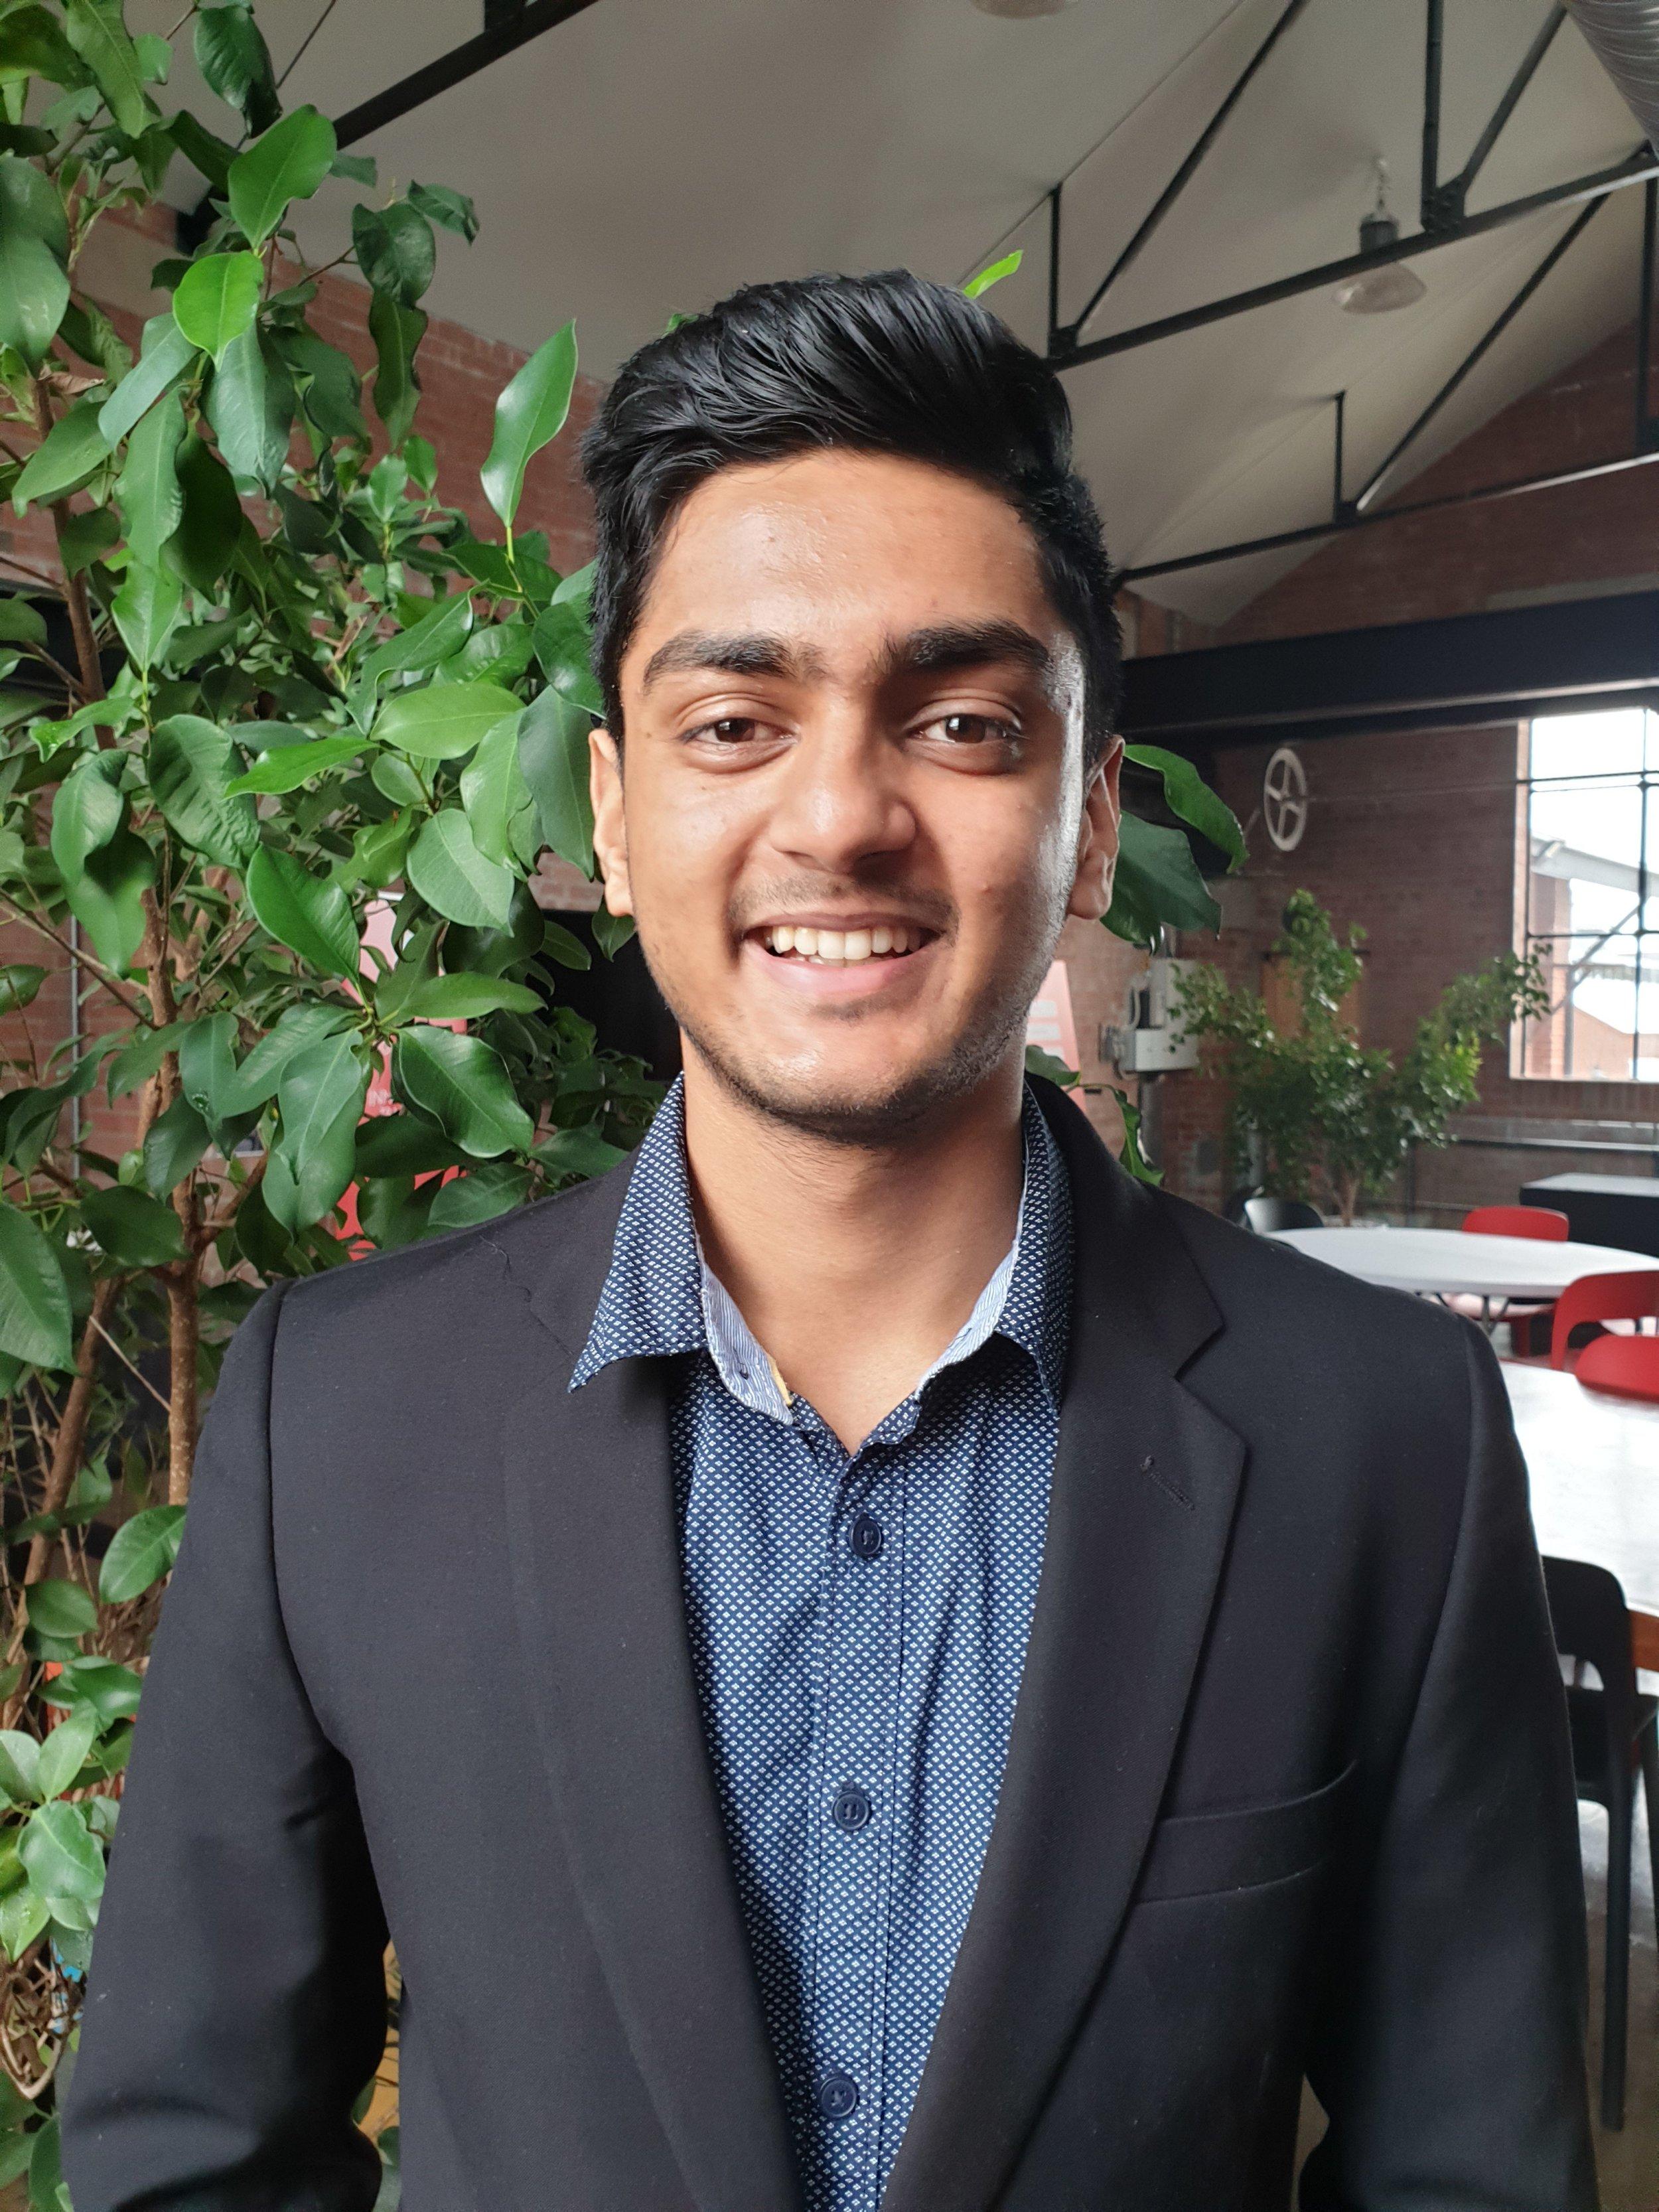 Abhilash Sengupta - Innovation Project Co-Ordinator